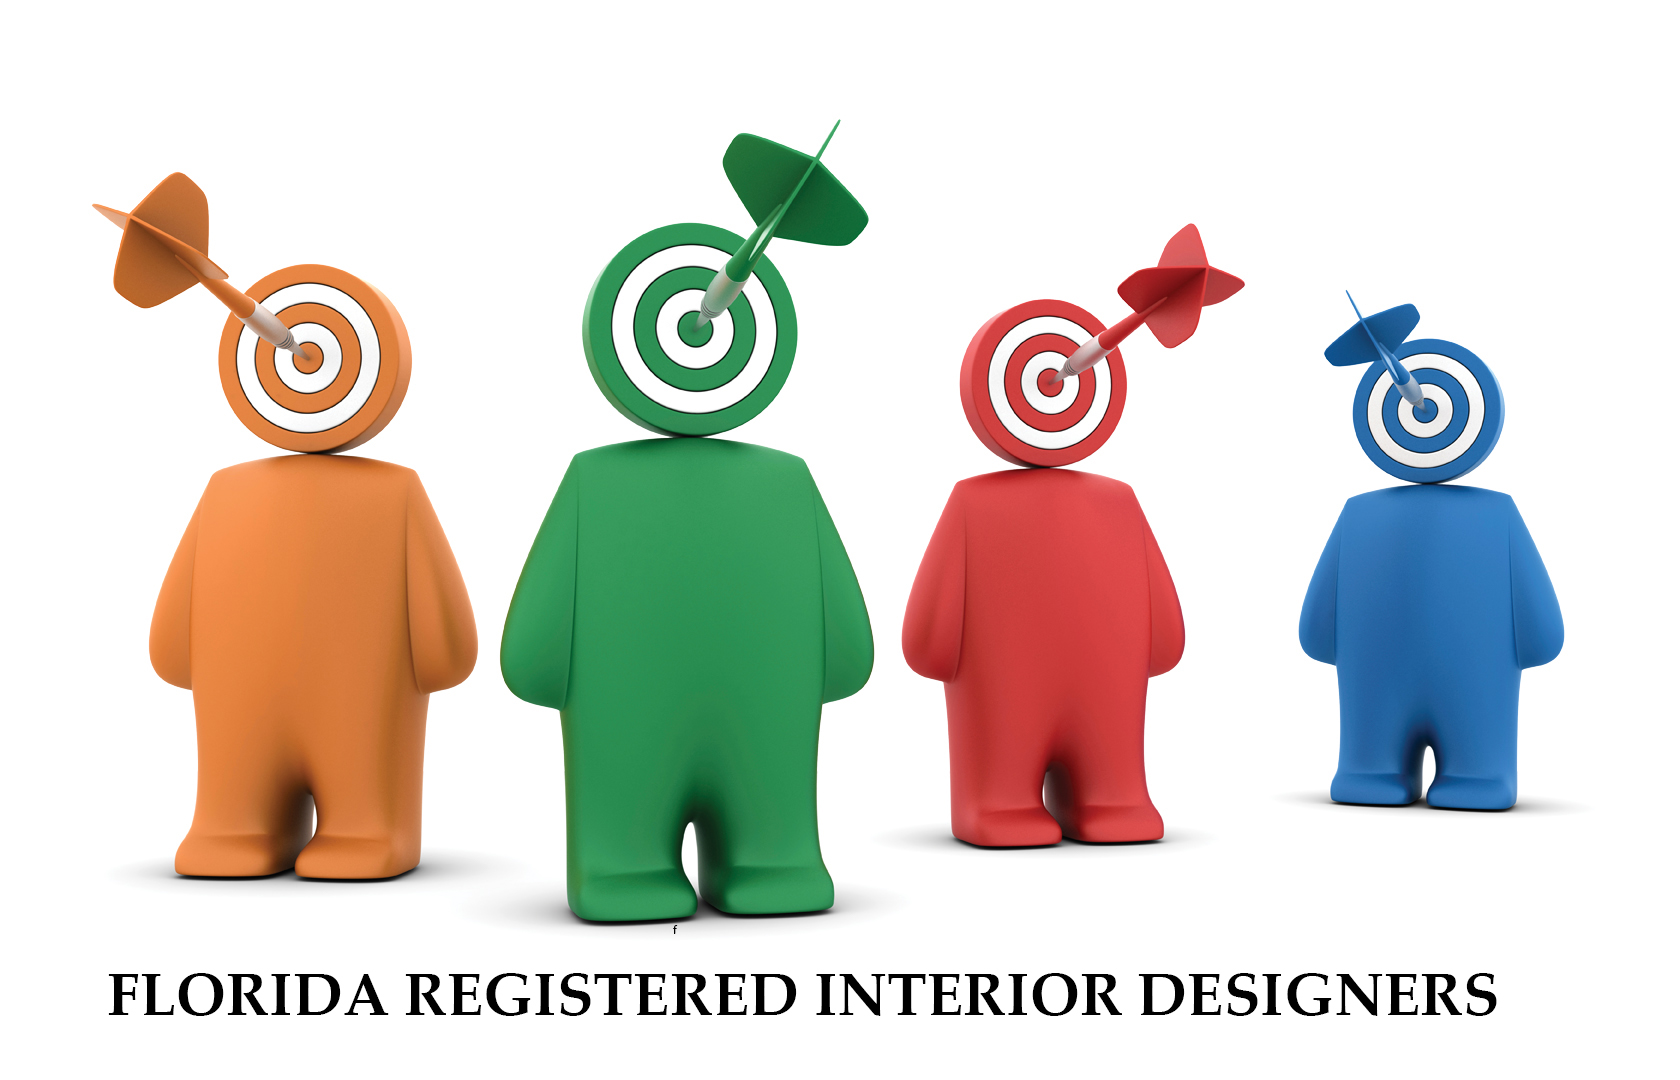 FLORIDA INTRODUCES BILL TO DEREGULATE INTERIOR DESIGN